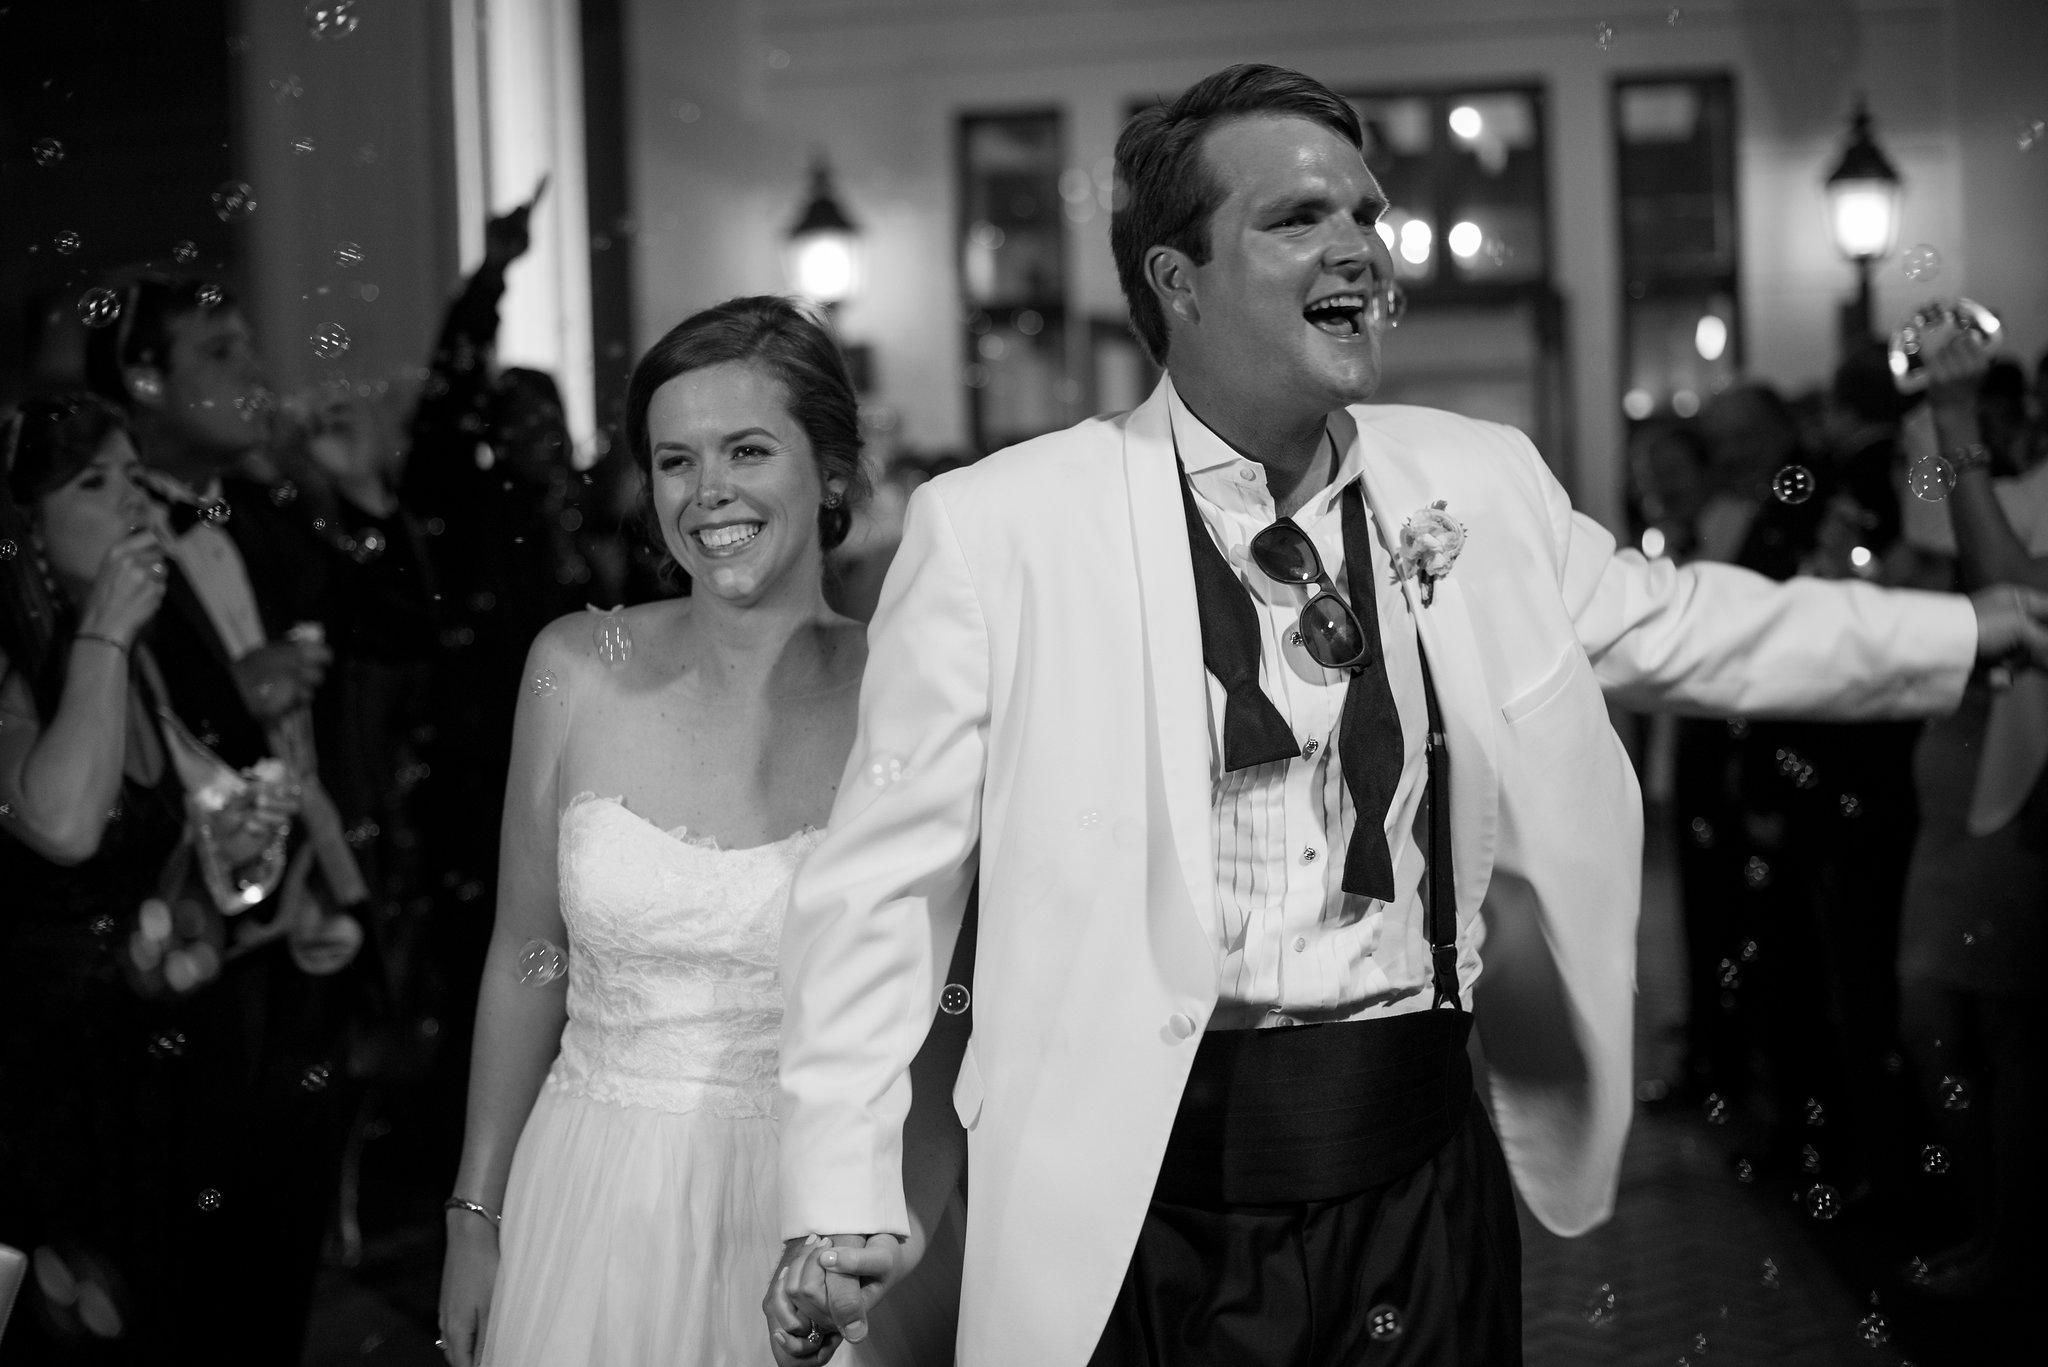 st-augustine-wedding-photographer-sarah-annay-photography.jpg31.jpg